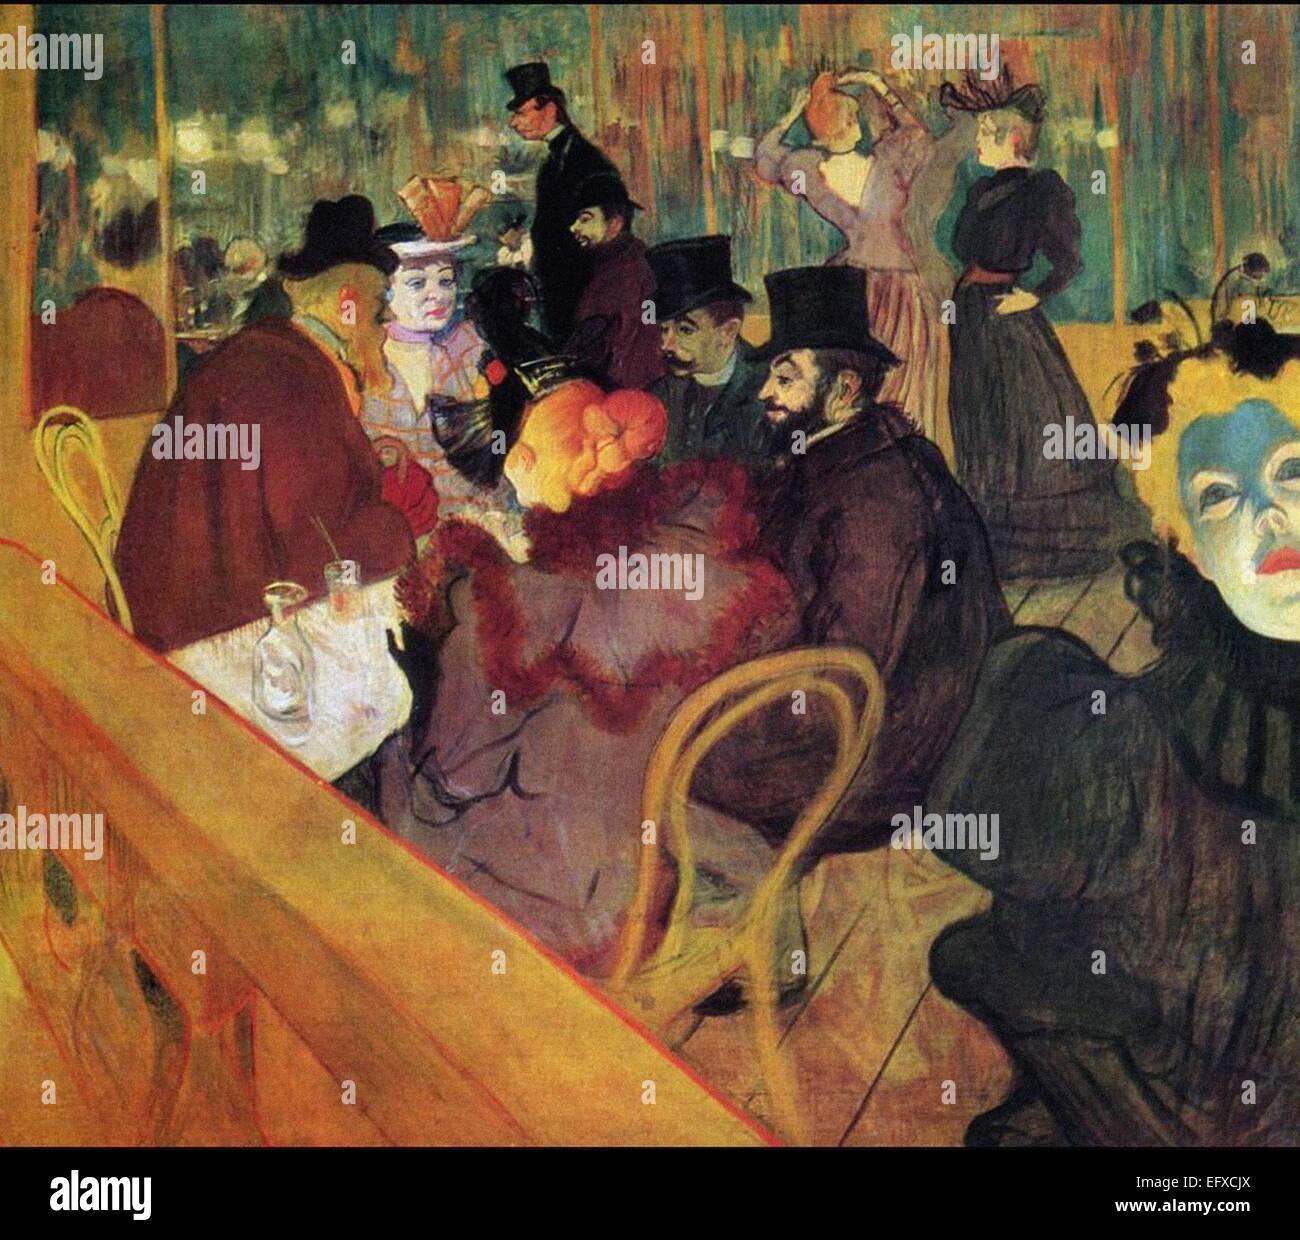 Henri Marie Raymond de Toulouse-Lautrec  At the Moulin Rouge - Stock Image